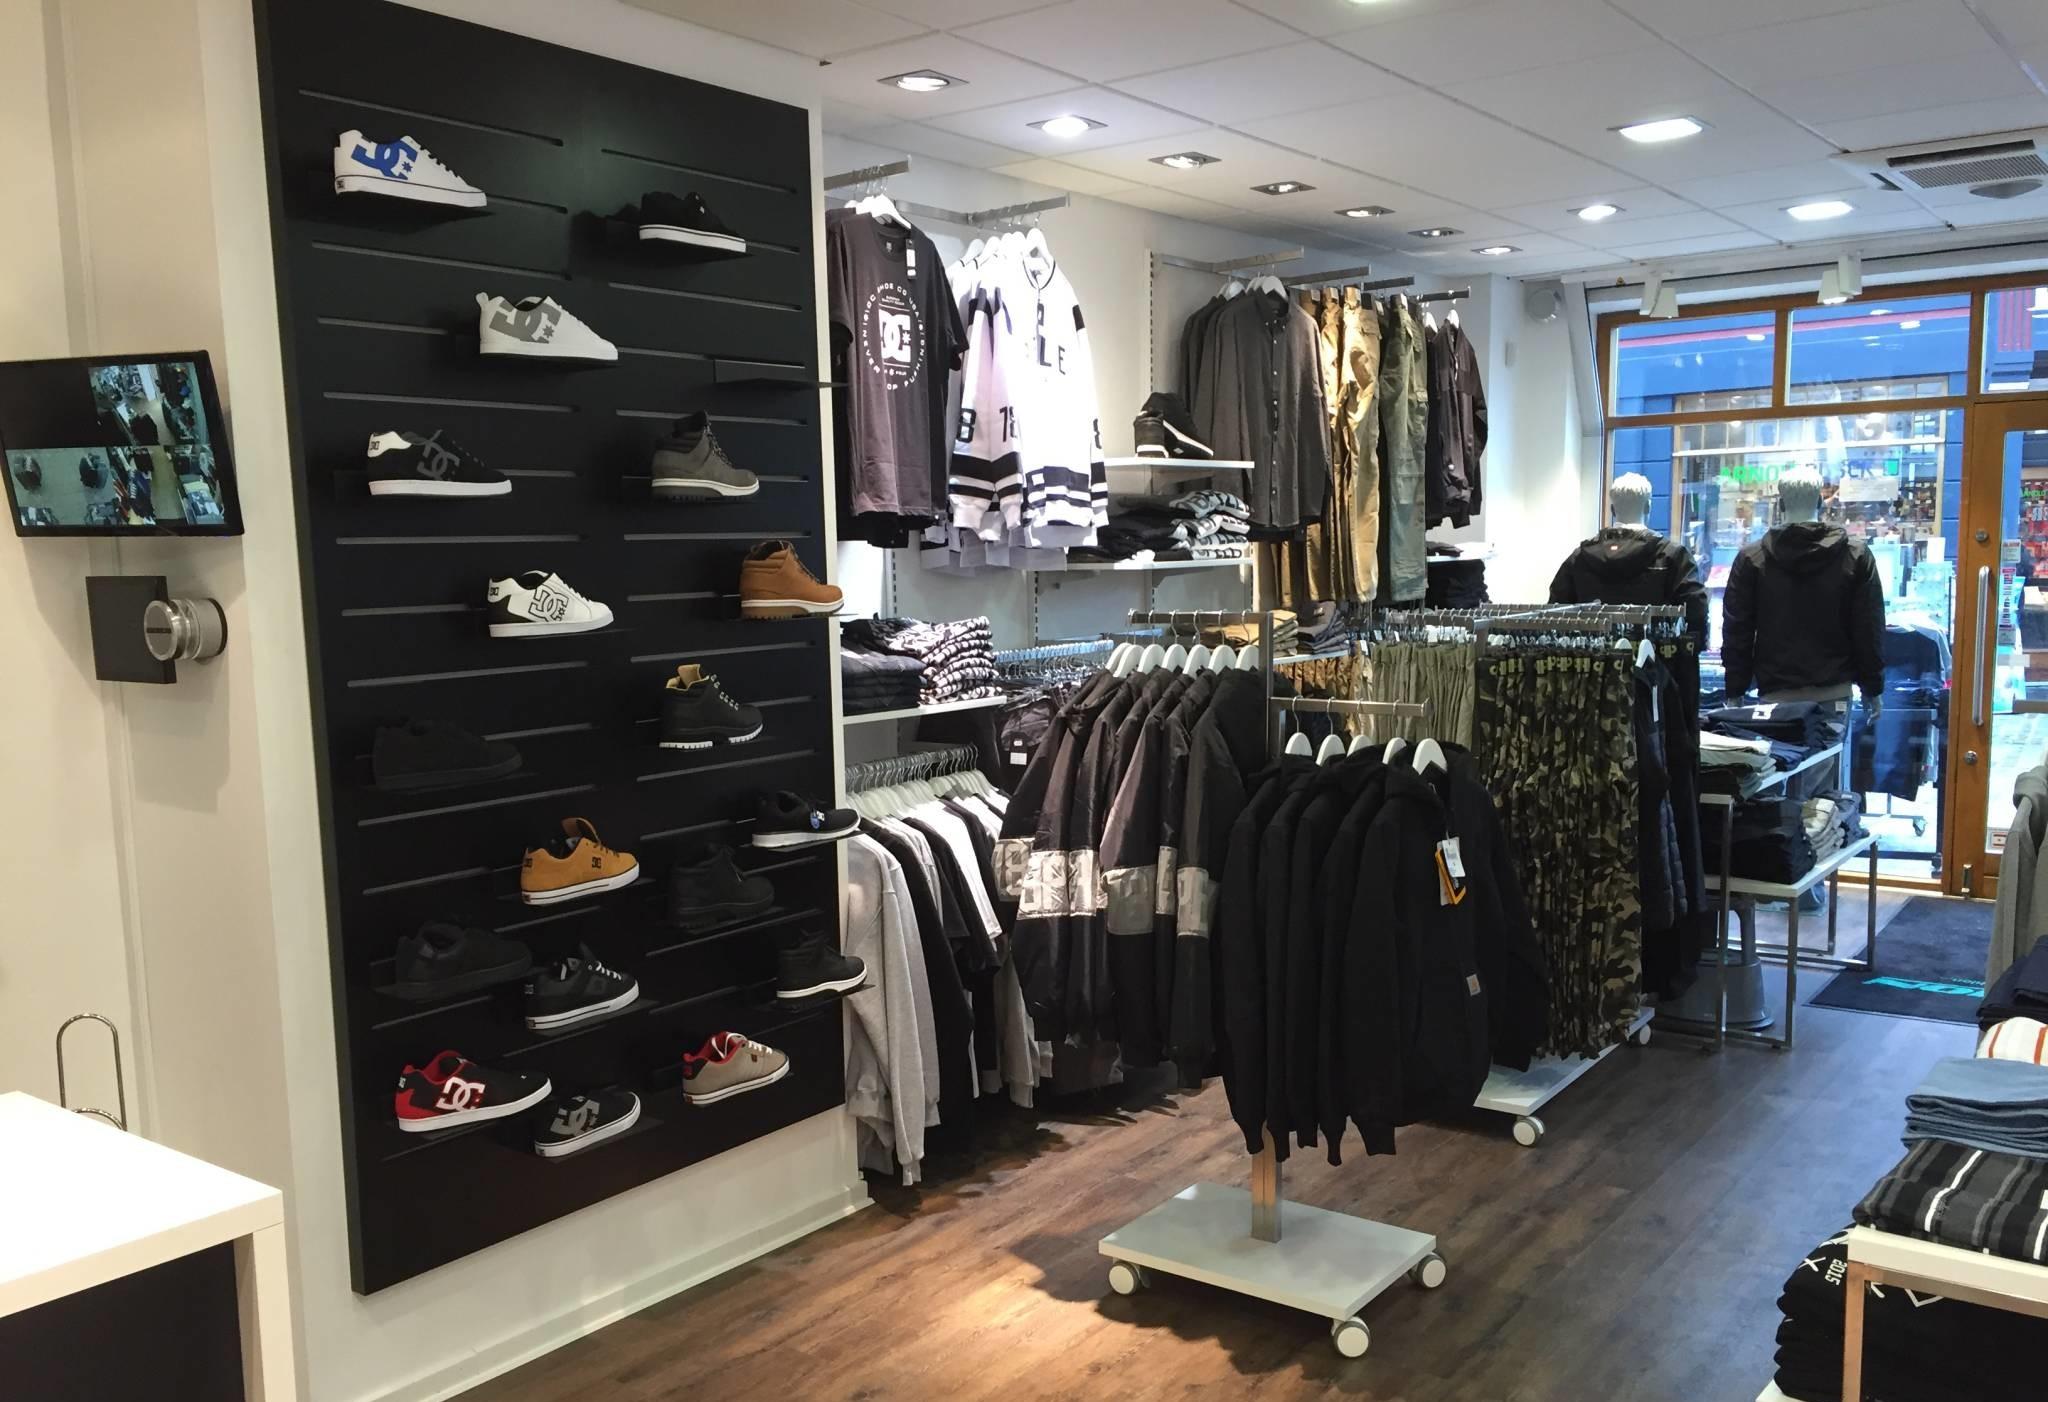 Butiksindretning som er specielt til sko og accessories. Panelpladerne kan leveres i alle farver. Butiksinventar